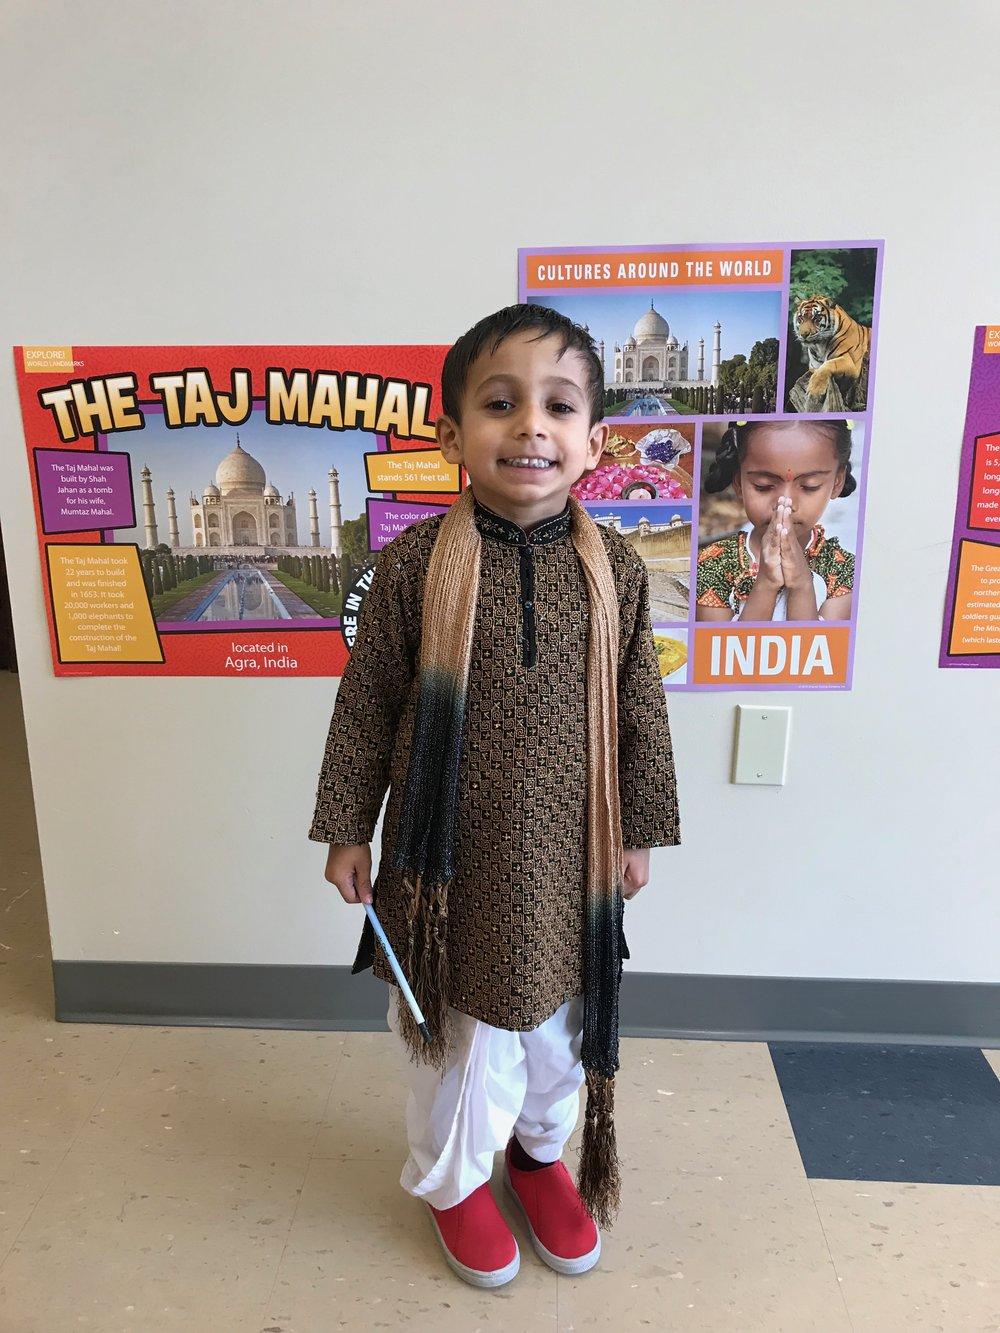 Representing India